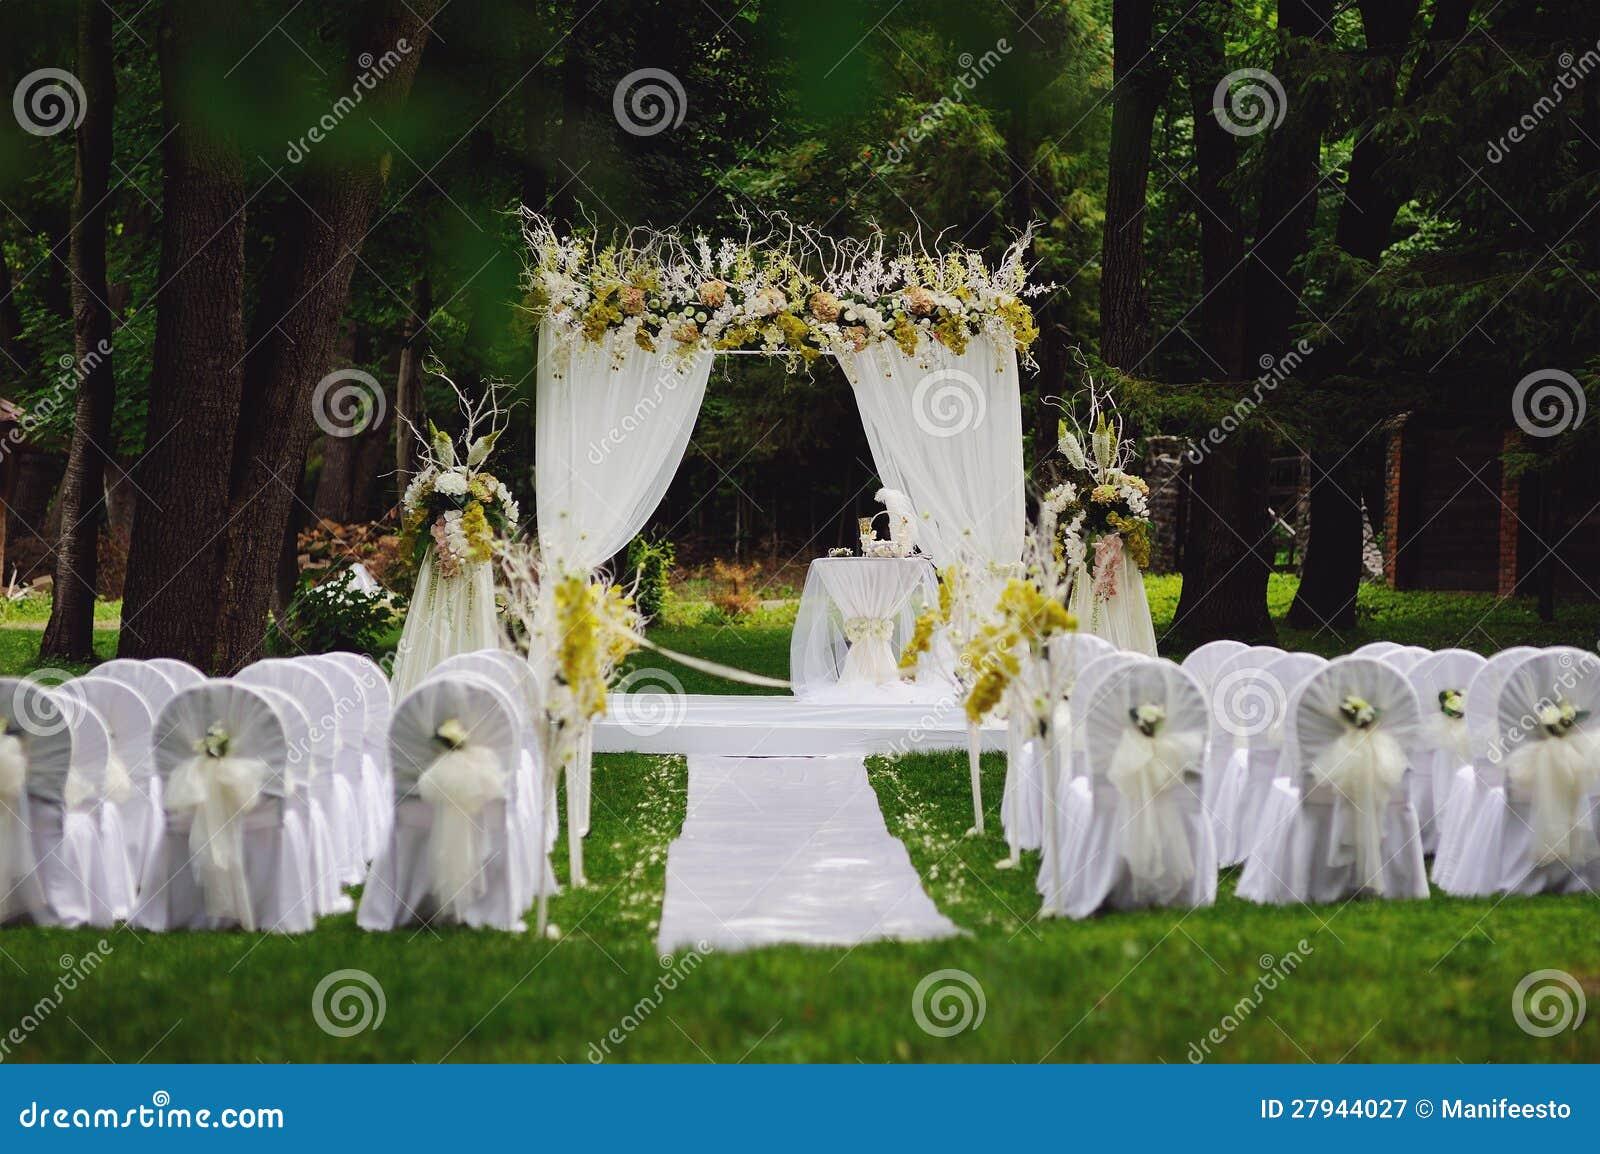 Ceremonia De Matrimonio Biblia Del Ministro : Ceremonia de la boda — cuadros